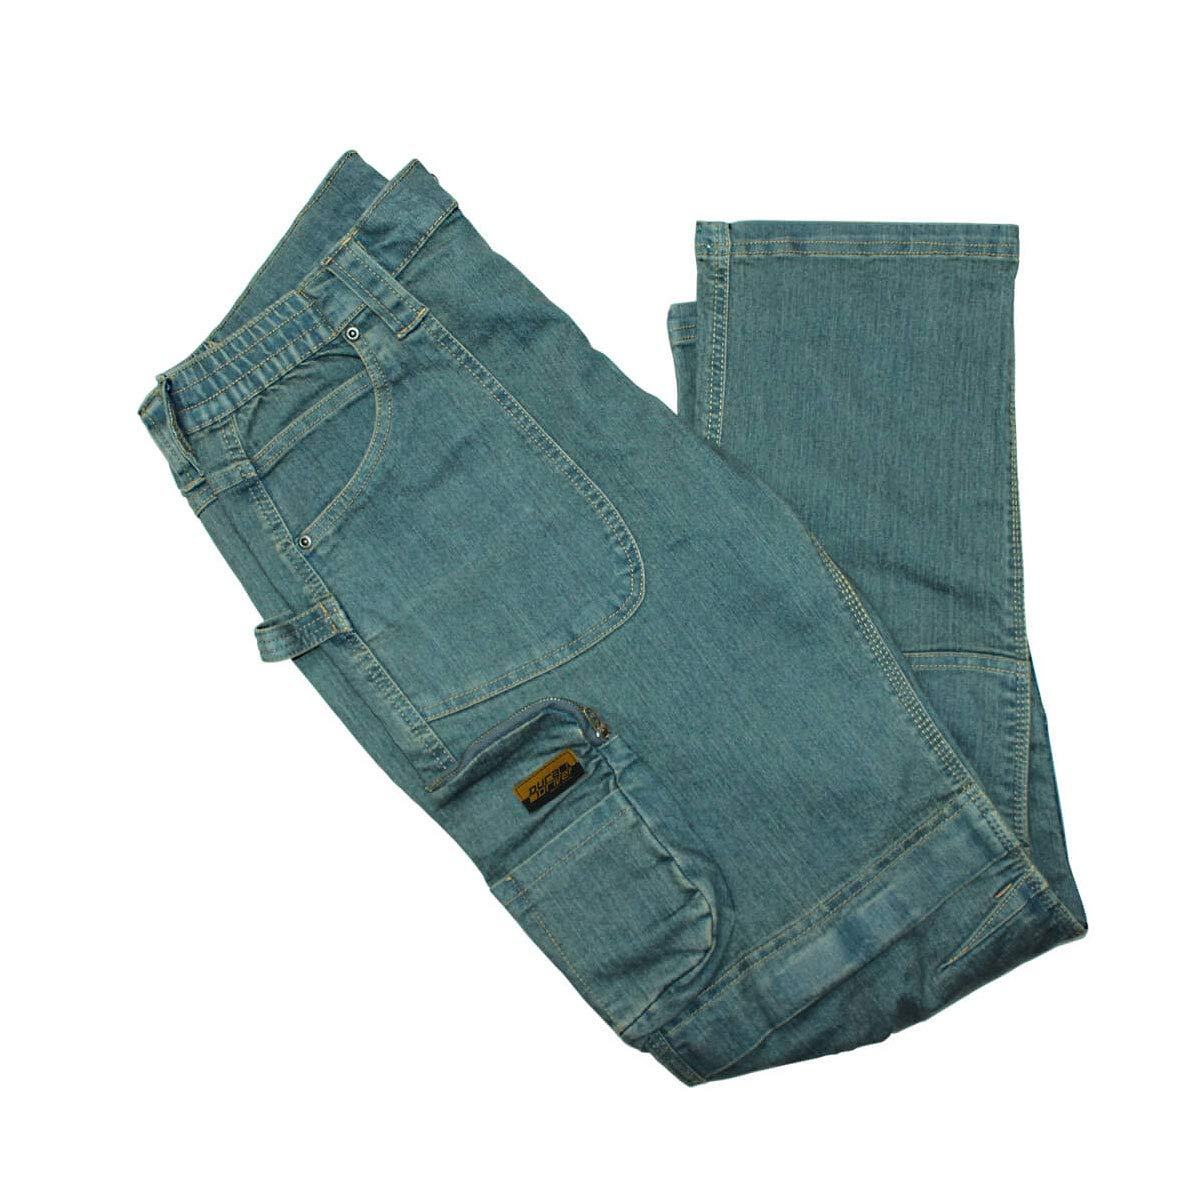 DuraDrive Denim Blue Jean Double Knee Work Pants